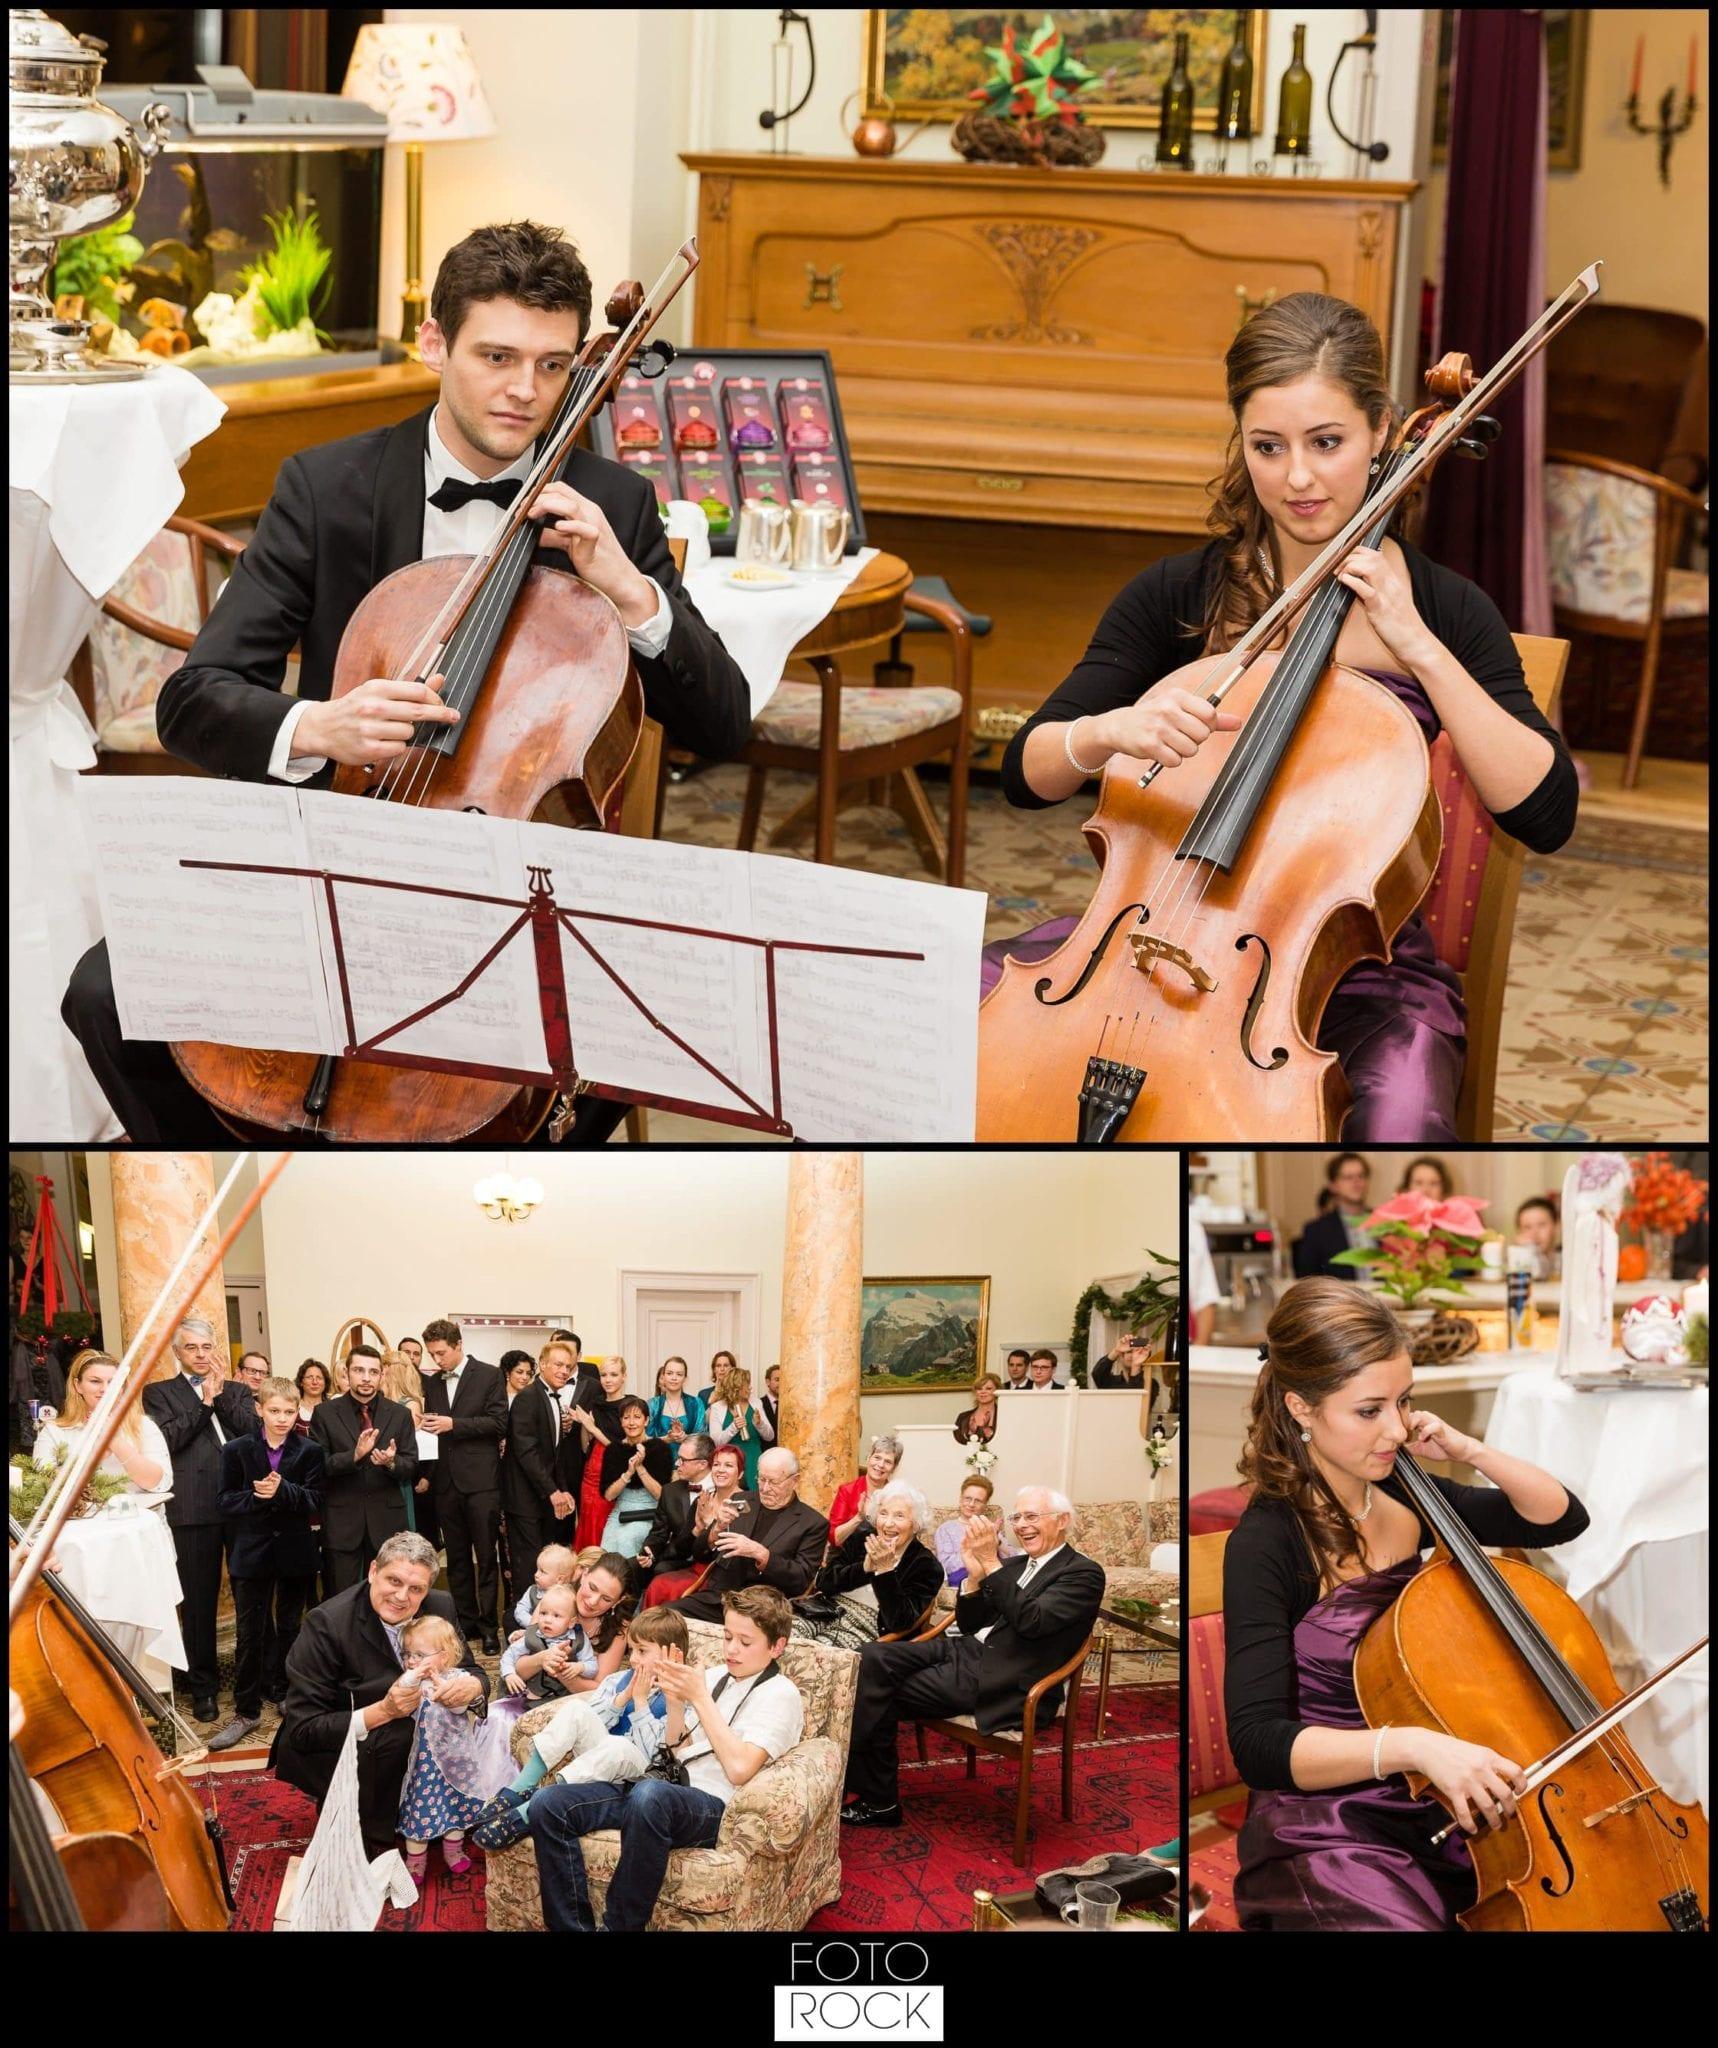 Hochzeit Winter Engelberg Location Musiker Musik Gäste